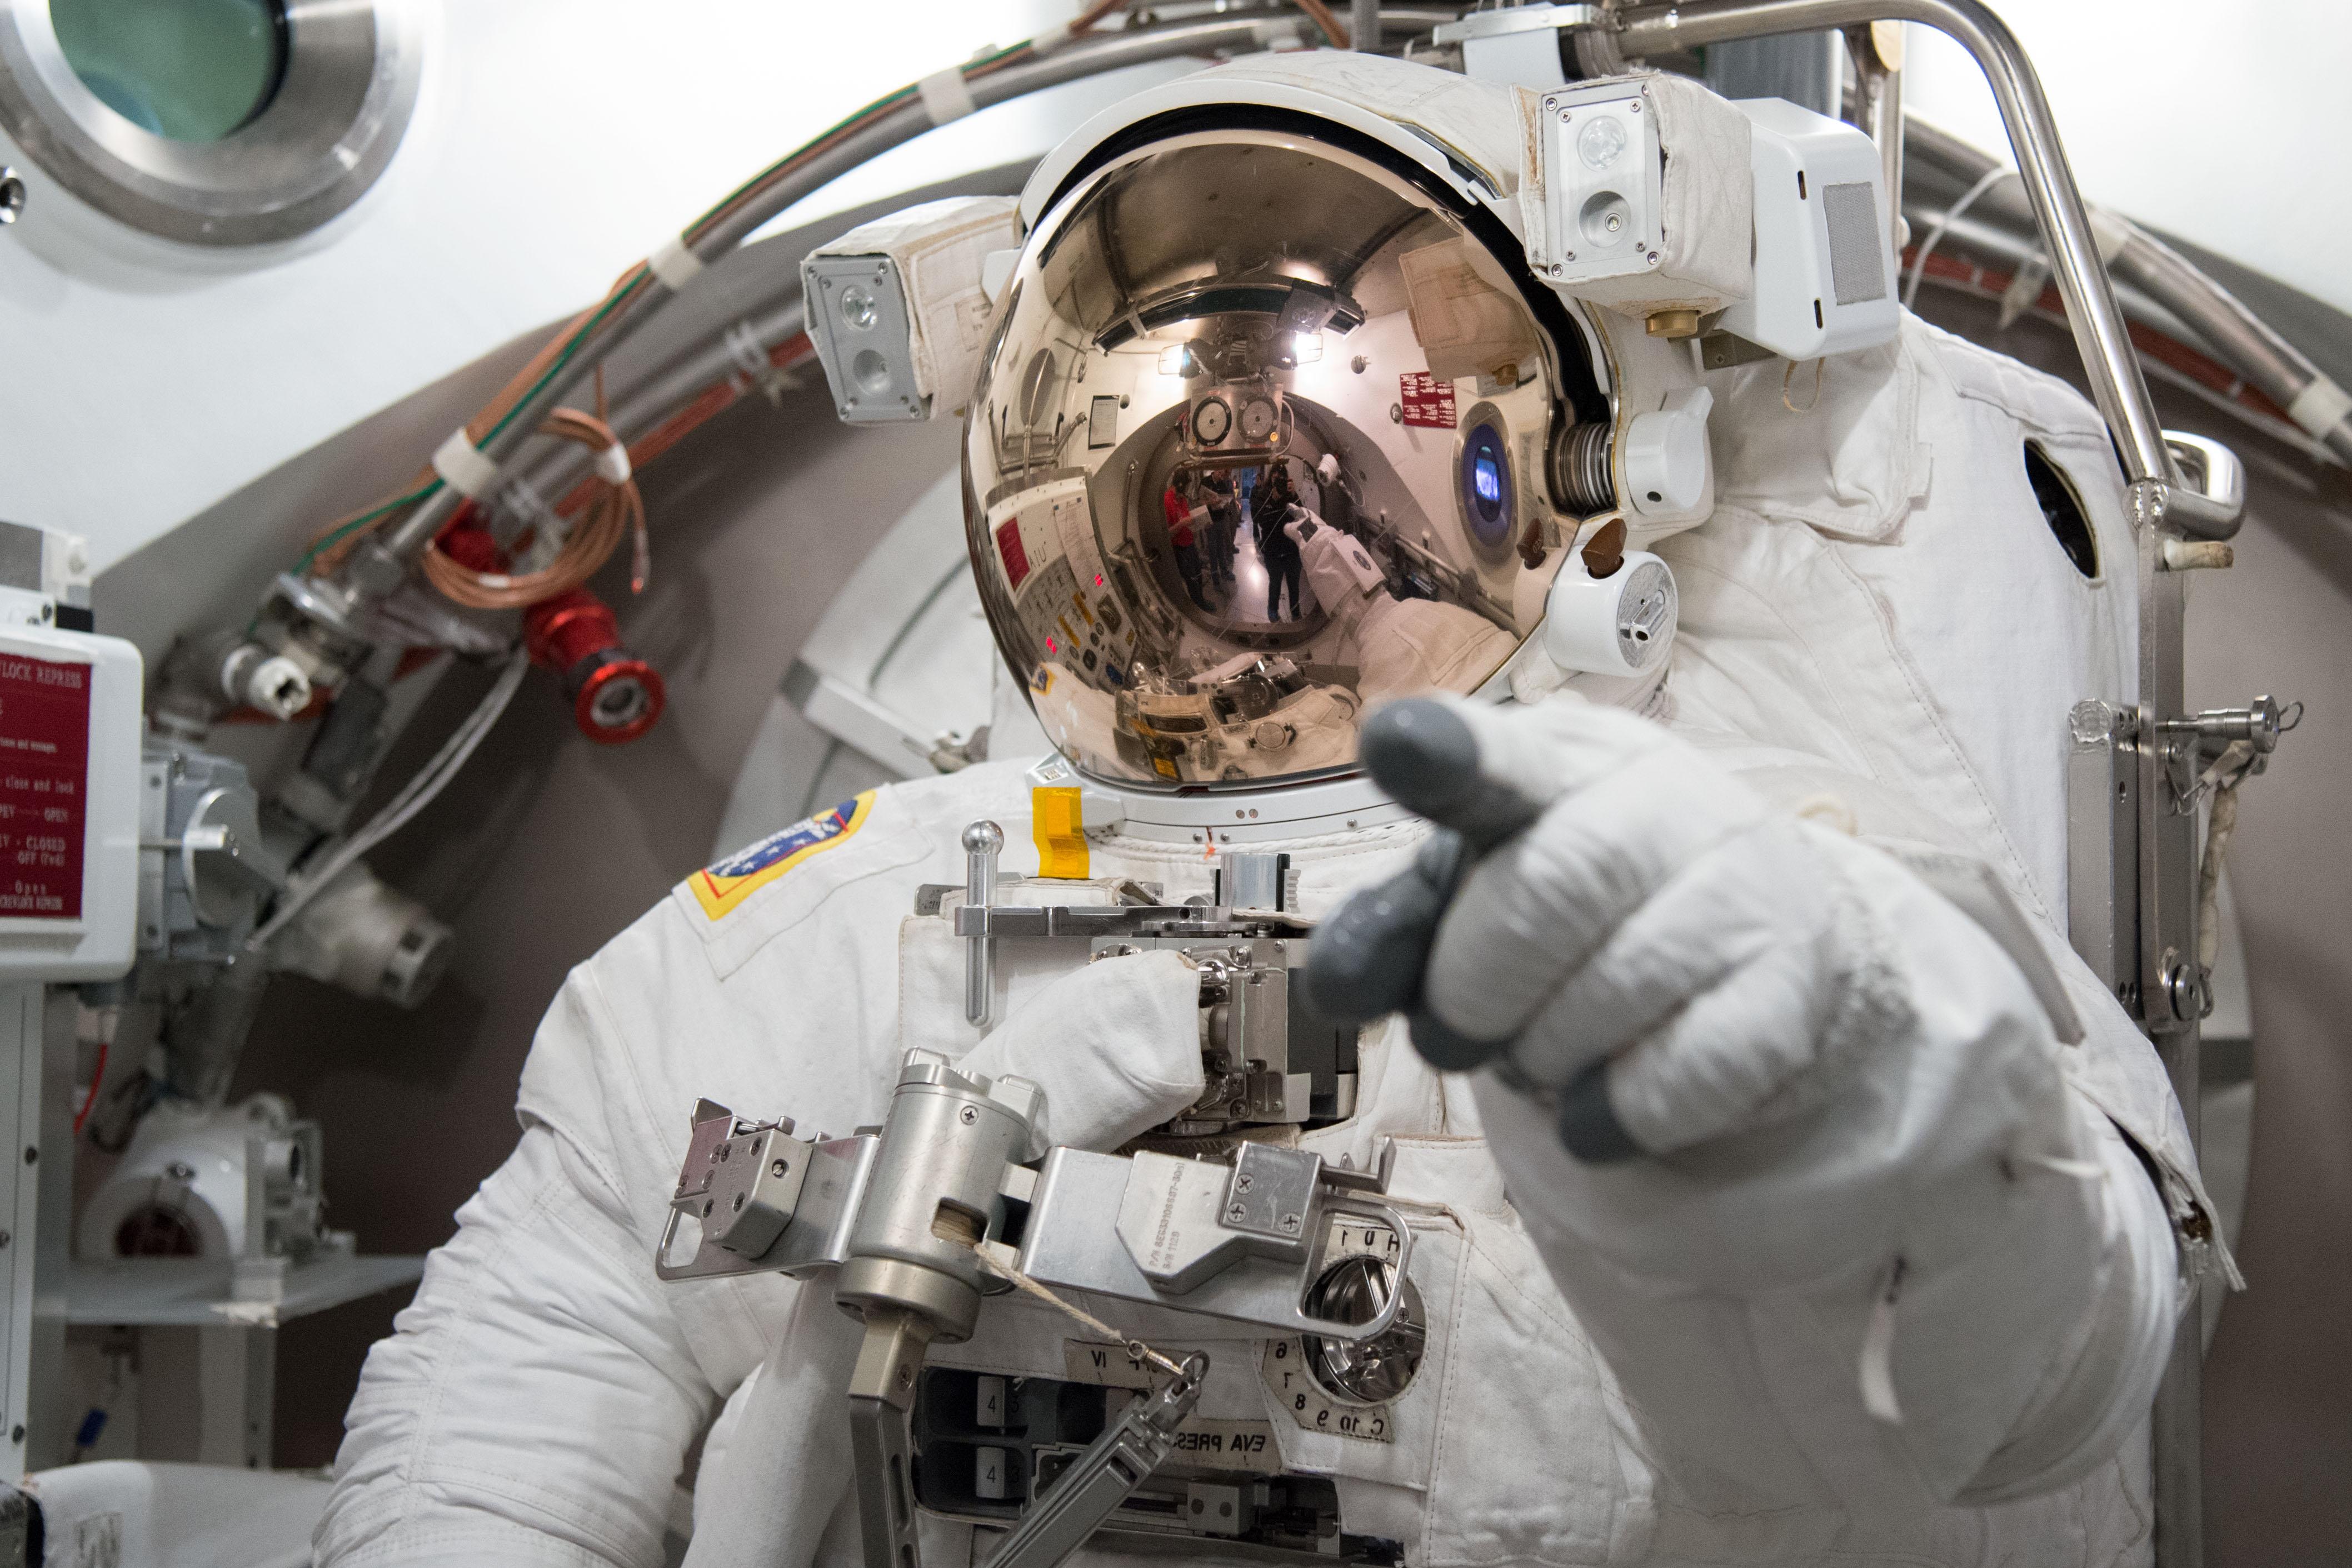 astronaut in the spacecraft - photo #40